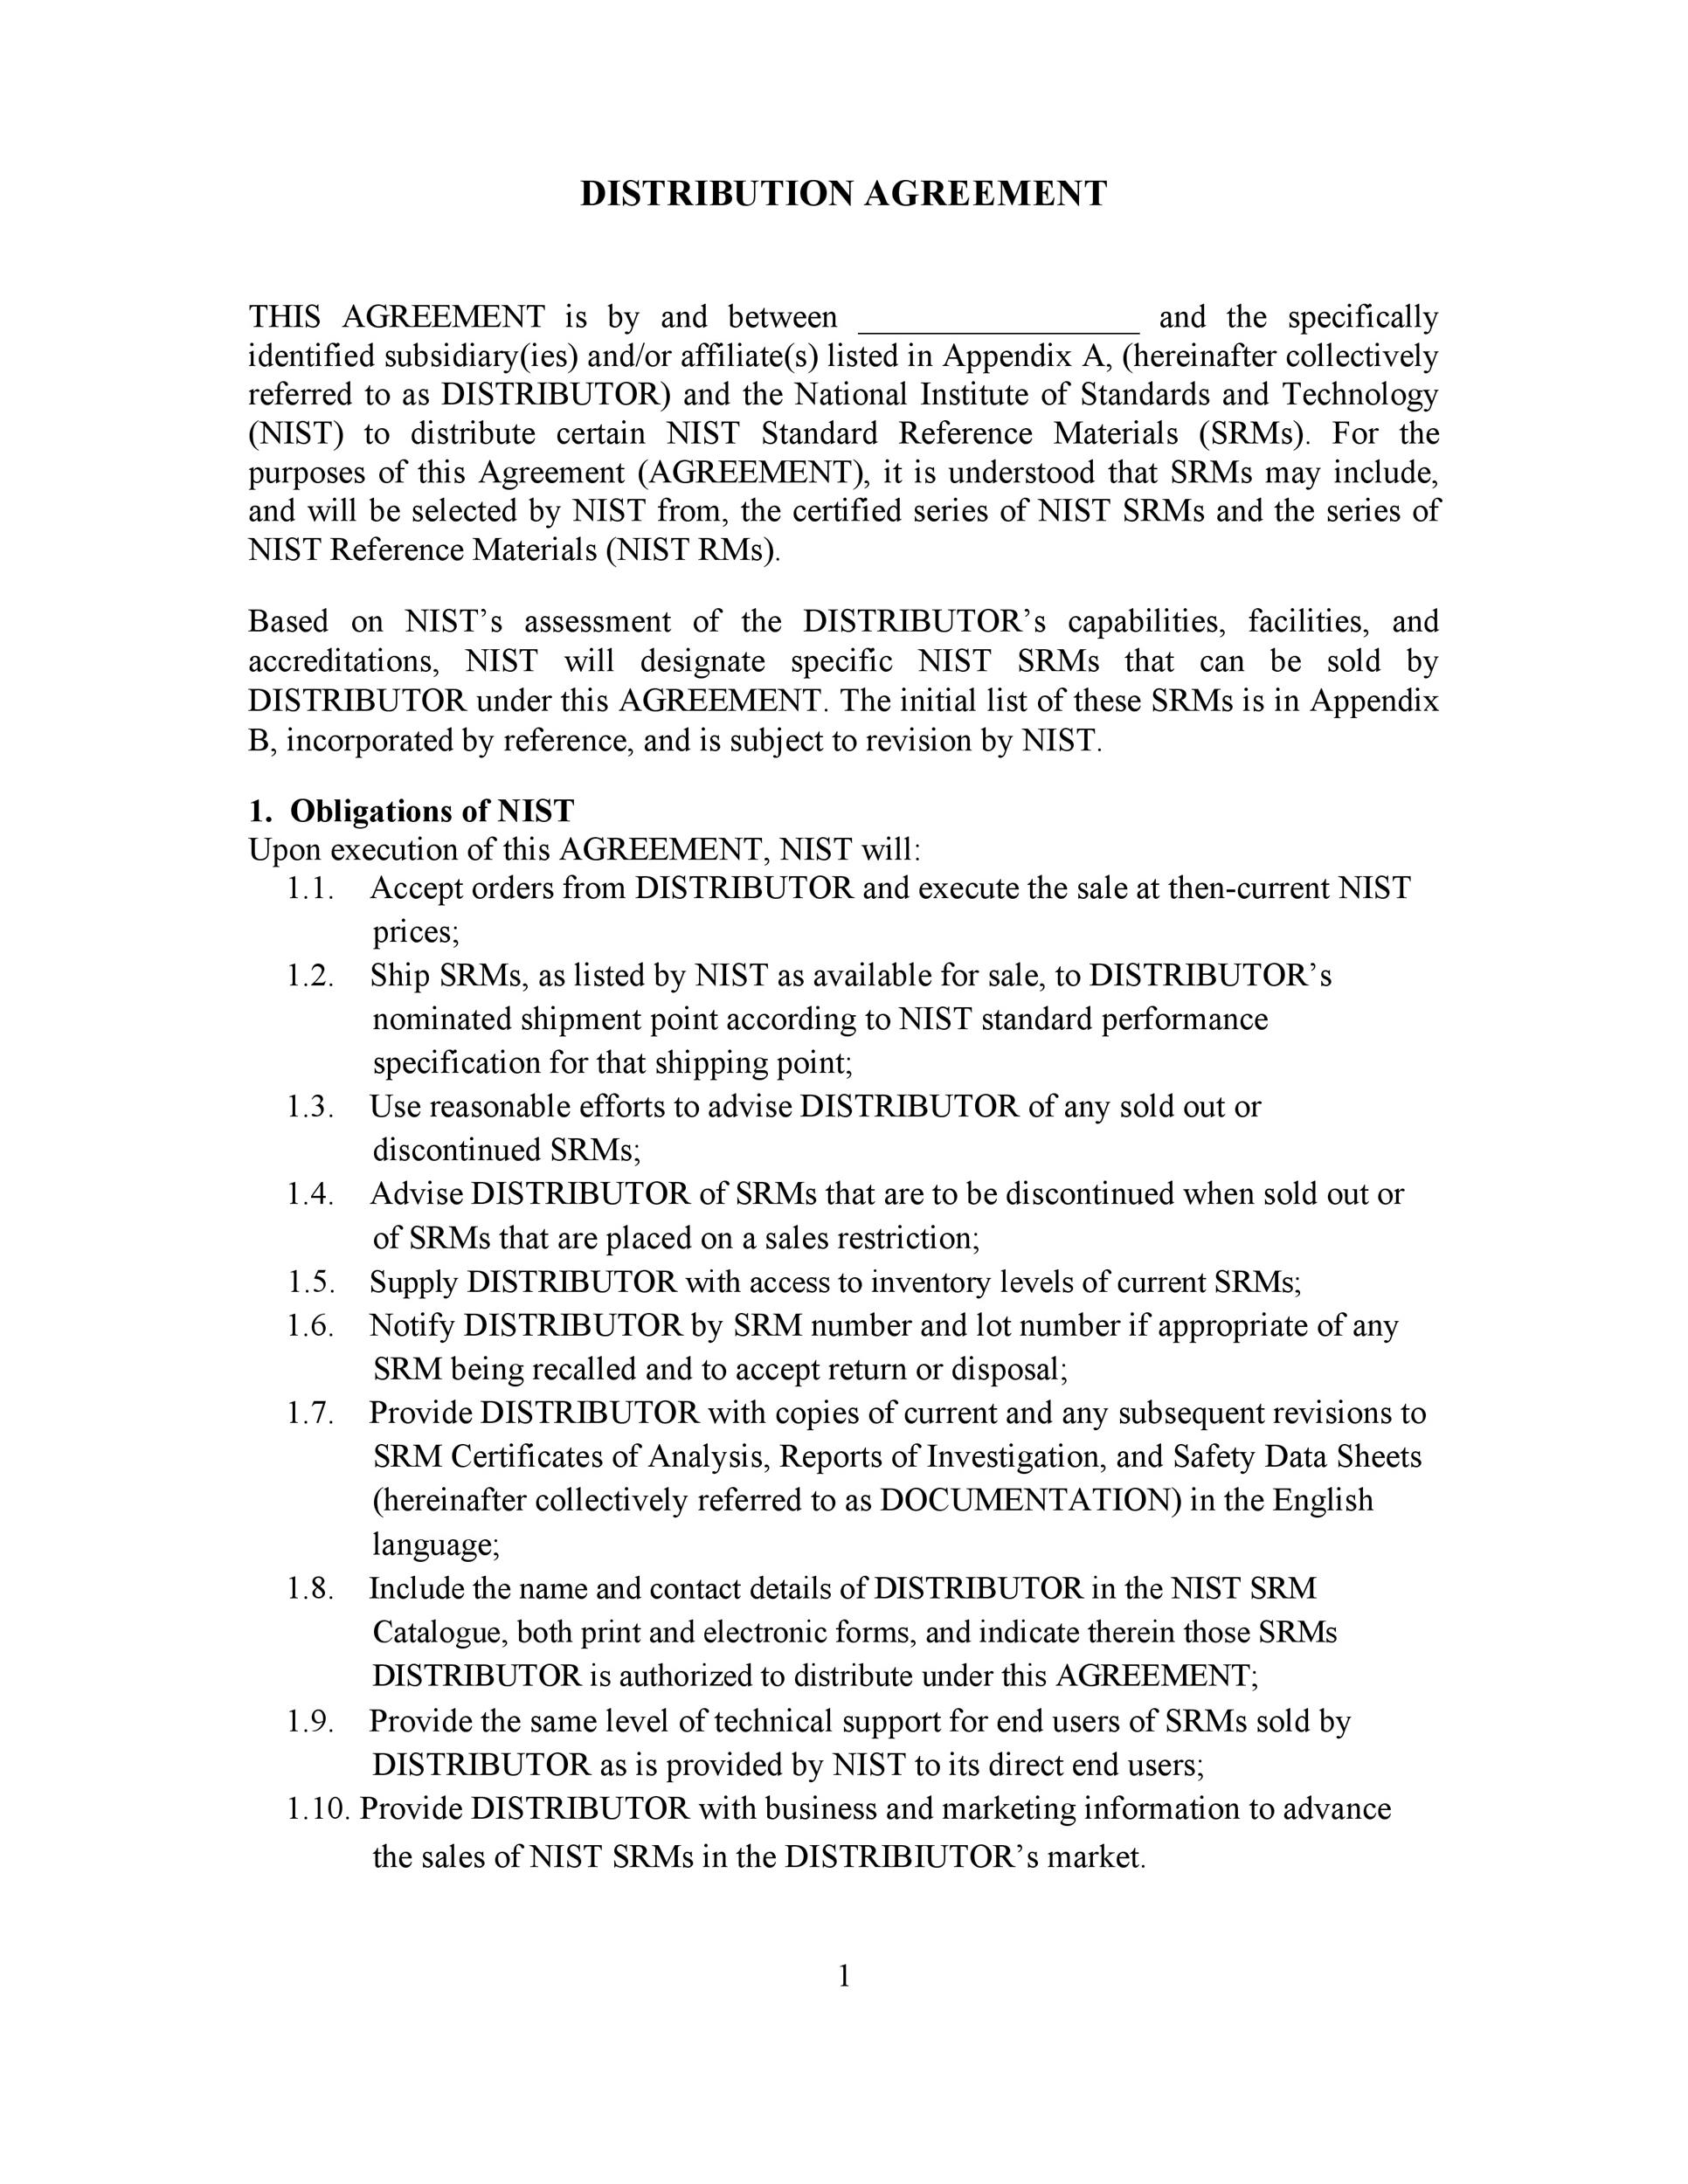 Free distribution agreement 09